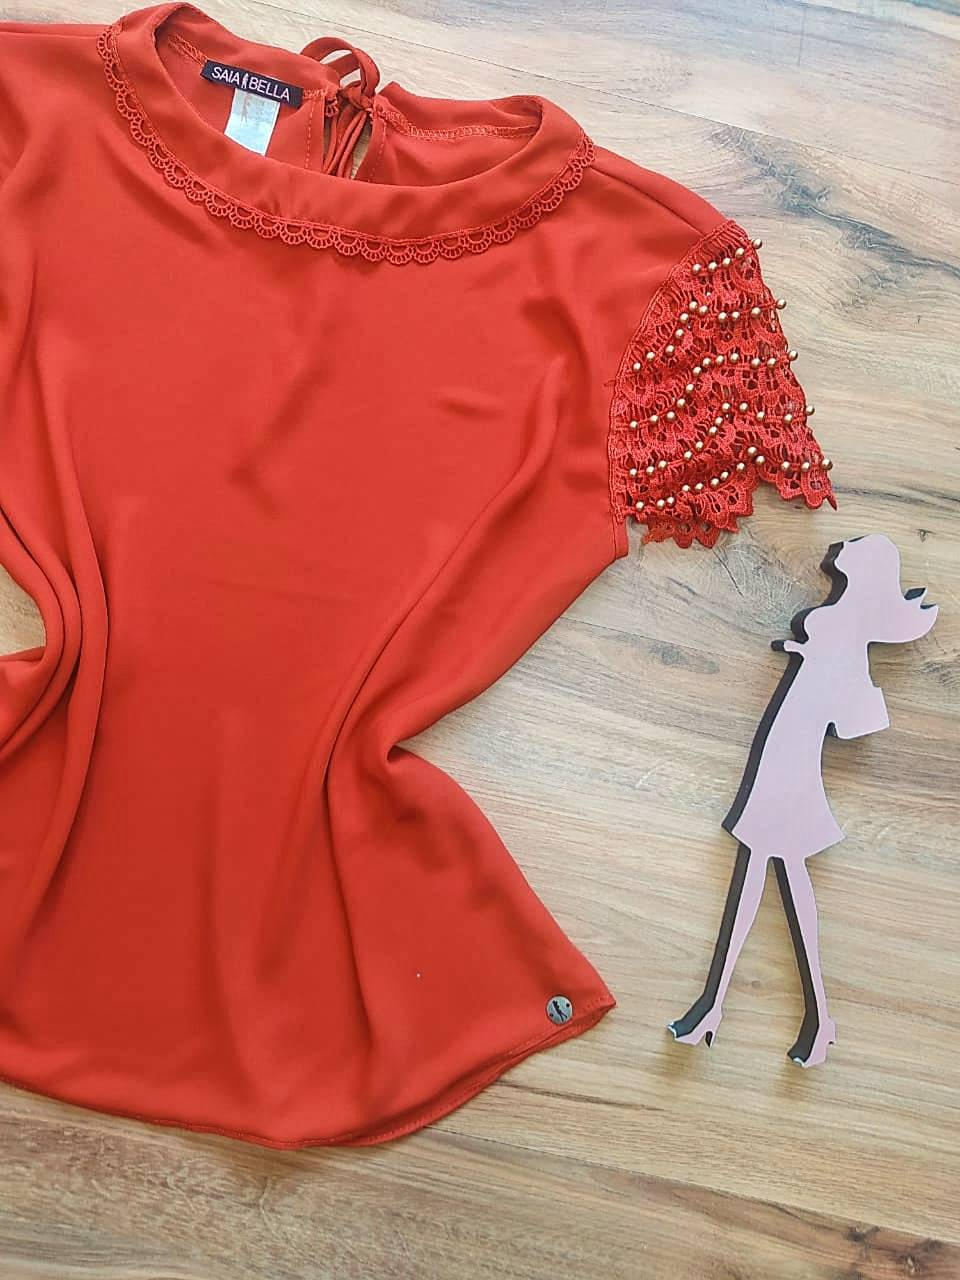 Blusa Clarisse de Renda Saia Bella - SB840701 -  Ferrugem